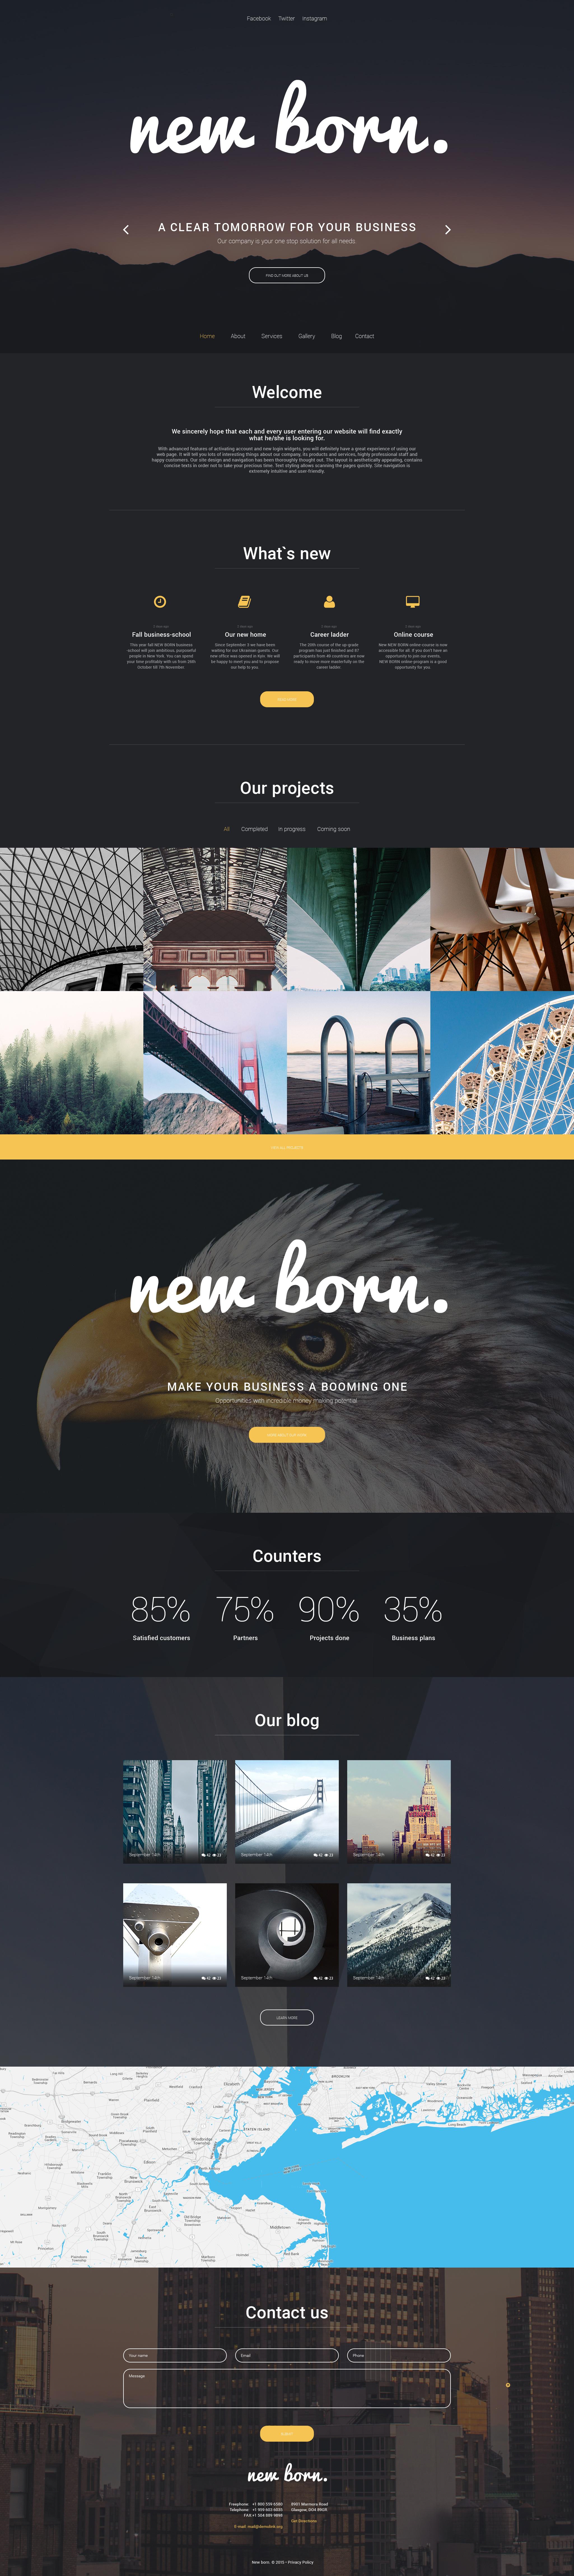 Business Agent WordPress Theme - screenshot